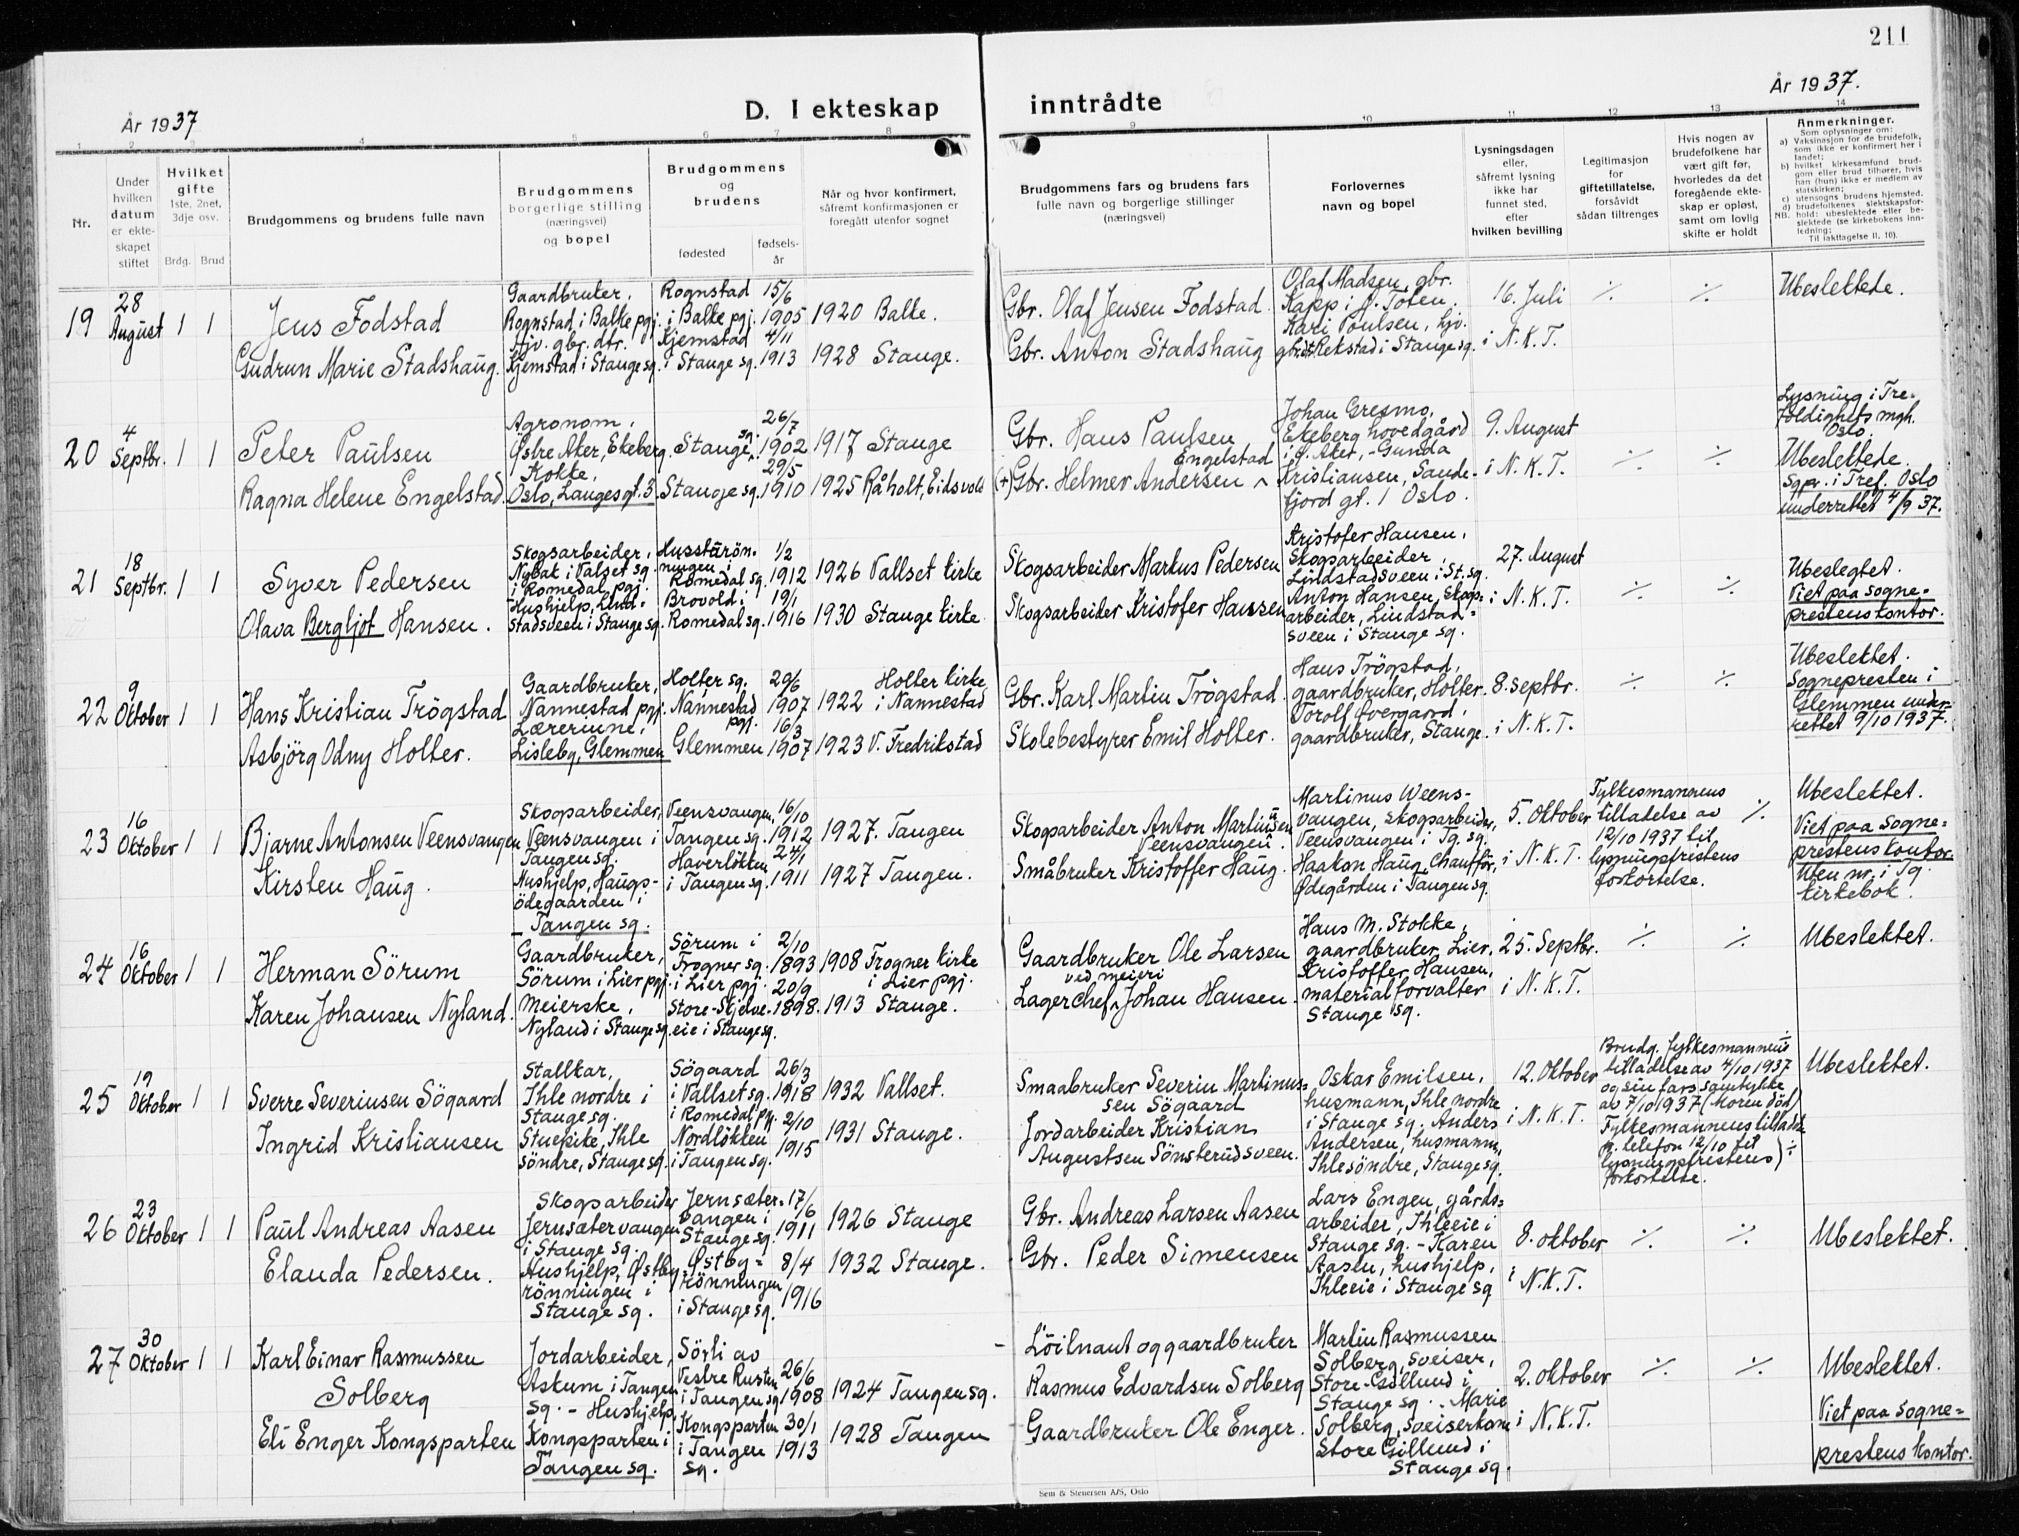 SAH, Stange prestekontor, K/L0027: Ministerialbok nr. 27, 1937-1947, s. 211